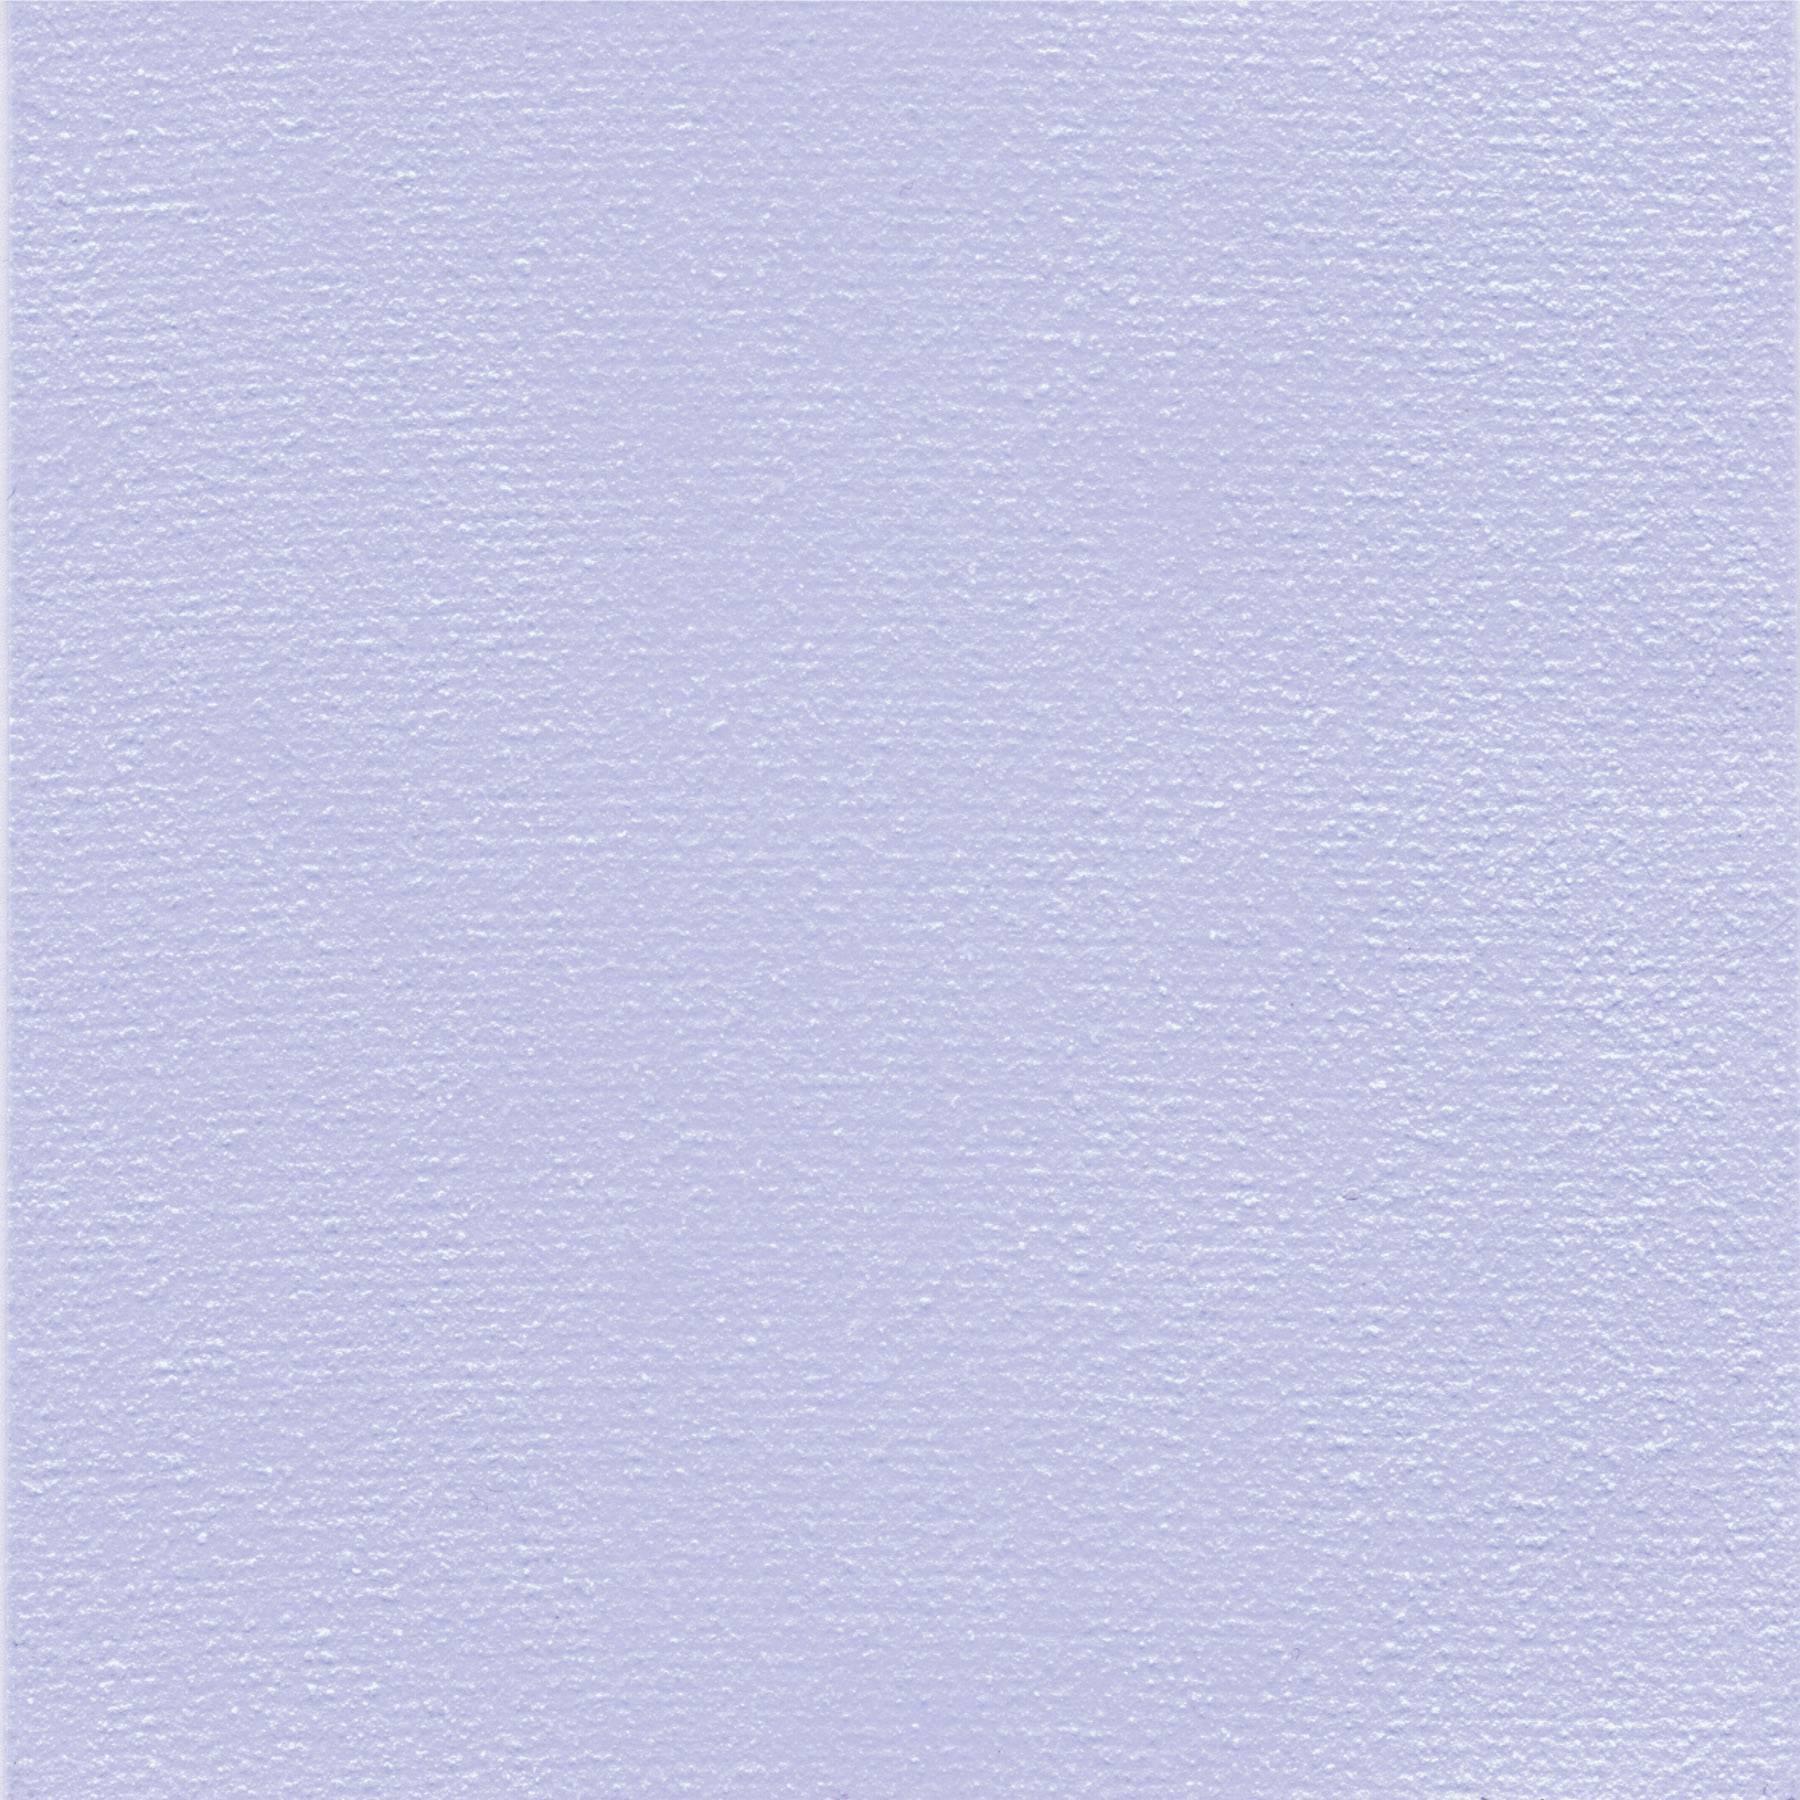 Teplovodivá fólia Kerafol SOFTTHERM 86/300, 1 mm, 3 W/mK, (d x š) 100 mm x 100 mm